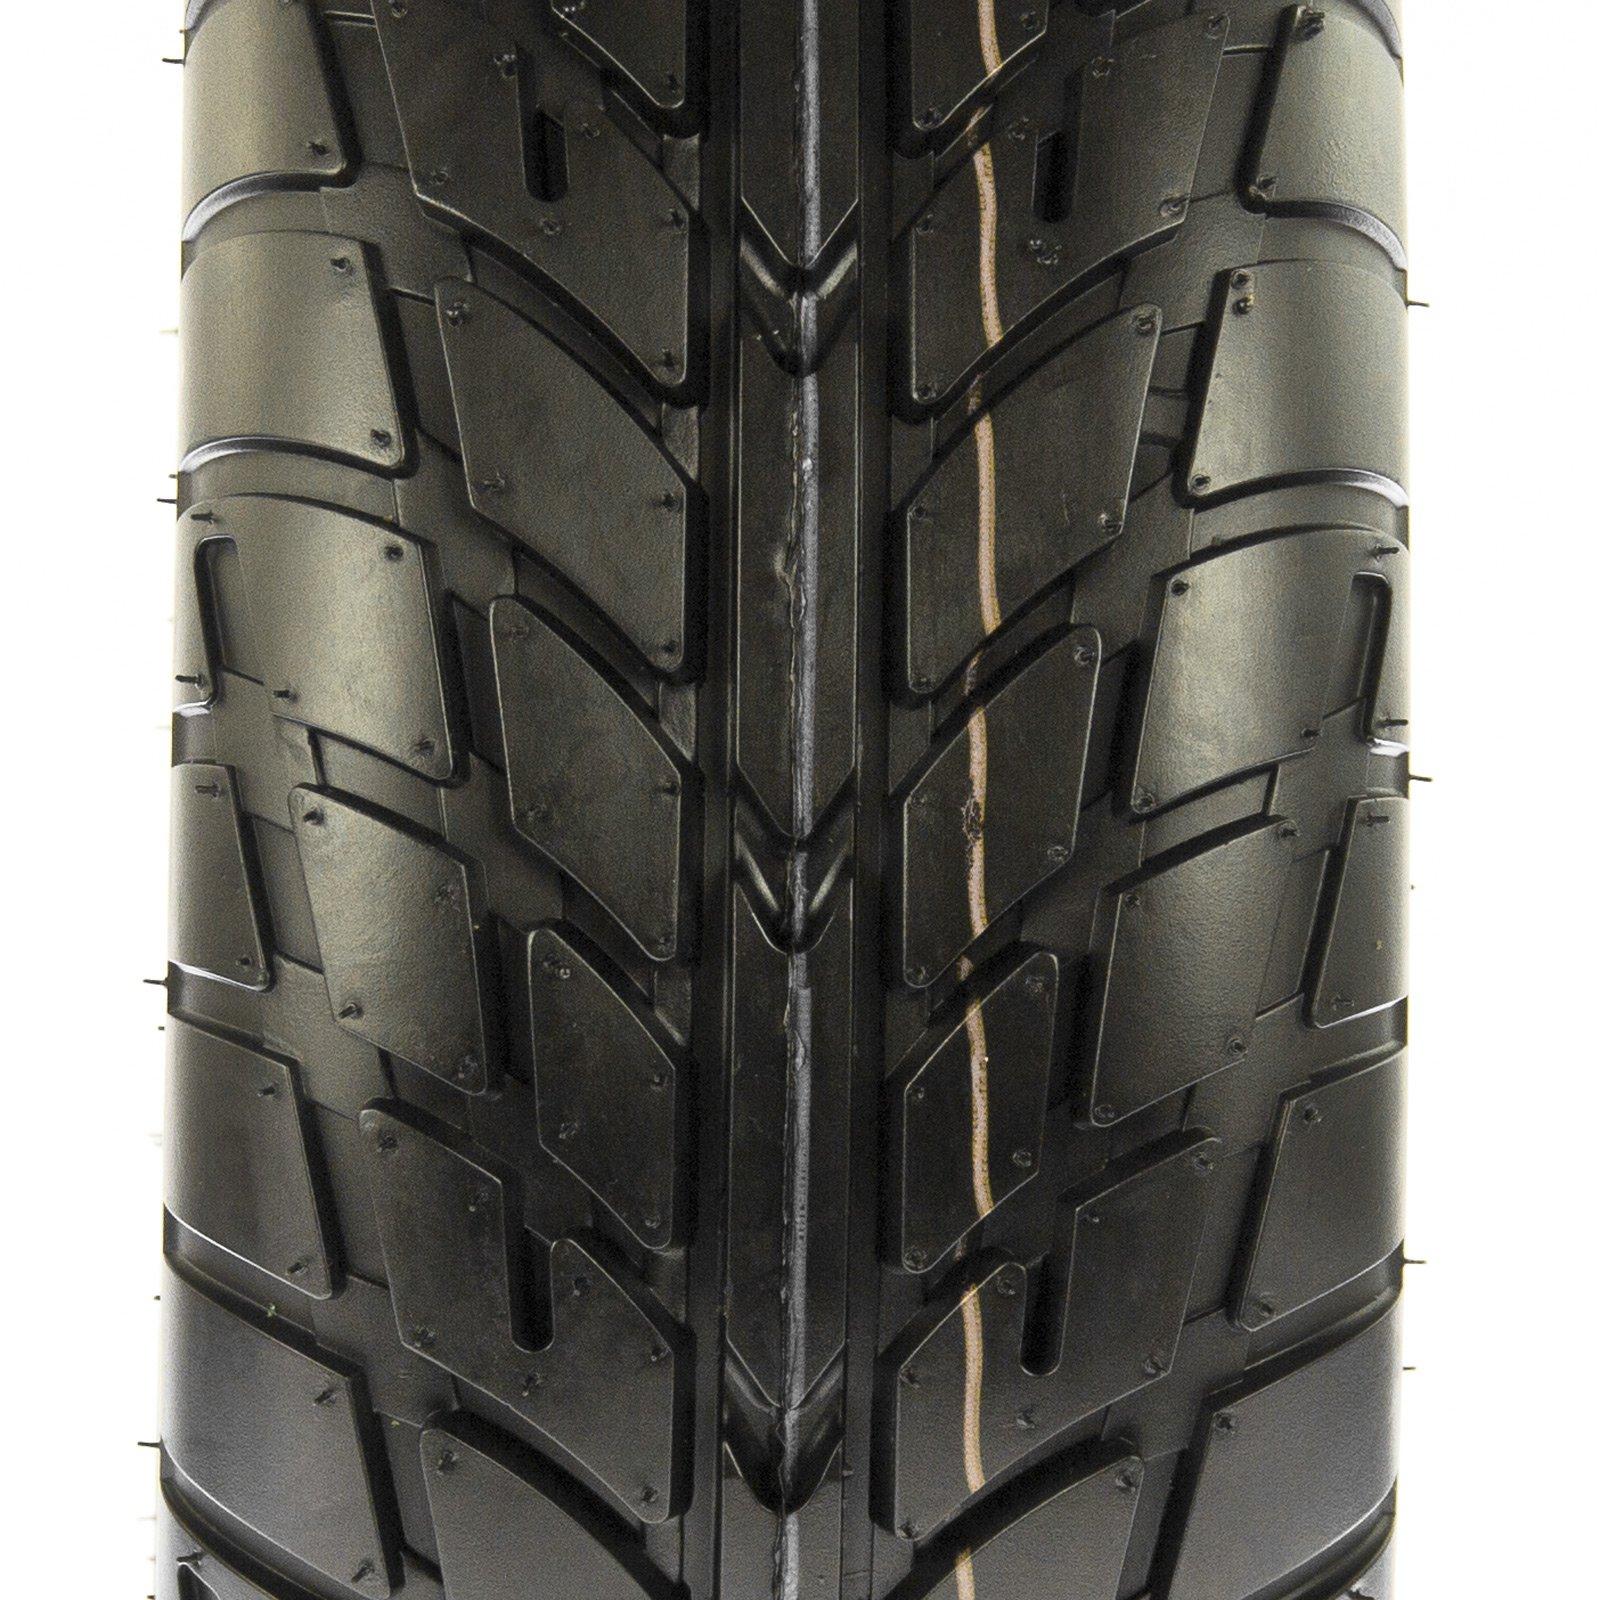 SunF Quad ATV Road Race Tires 225/45-10 225 45 10 4 PR A021 (Full set of 4) by SunF (Image #5)